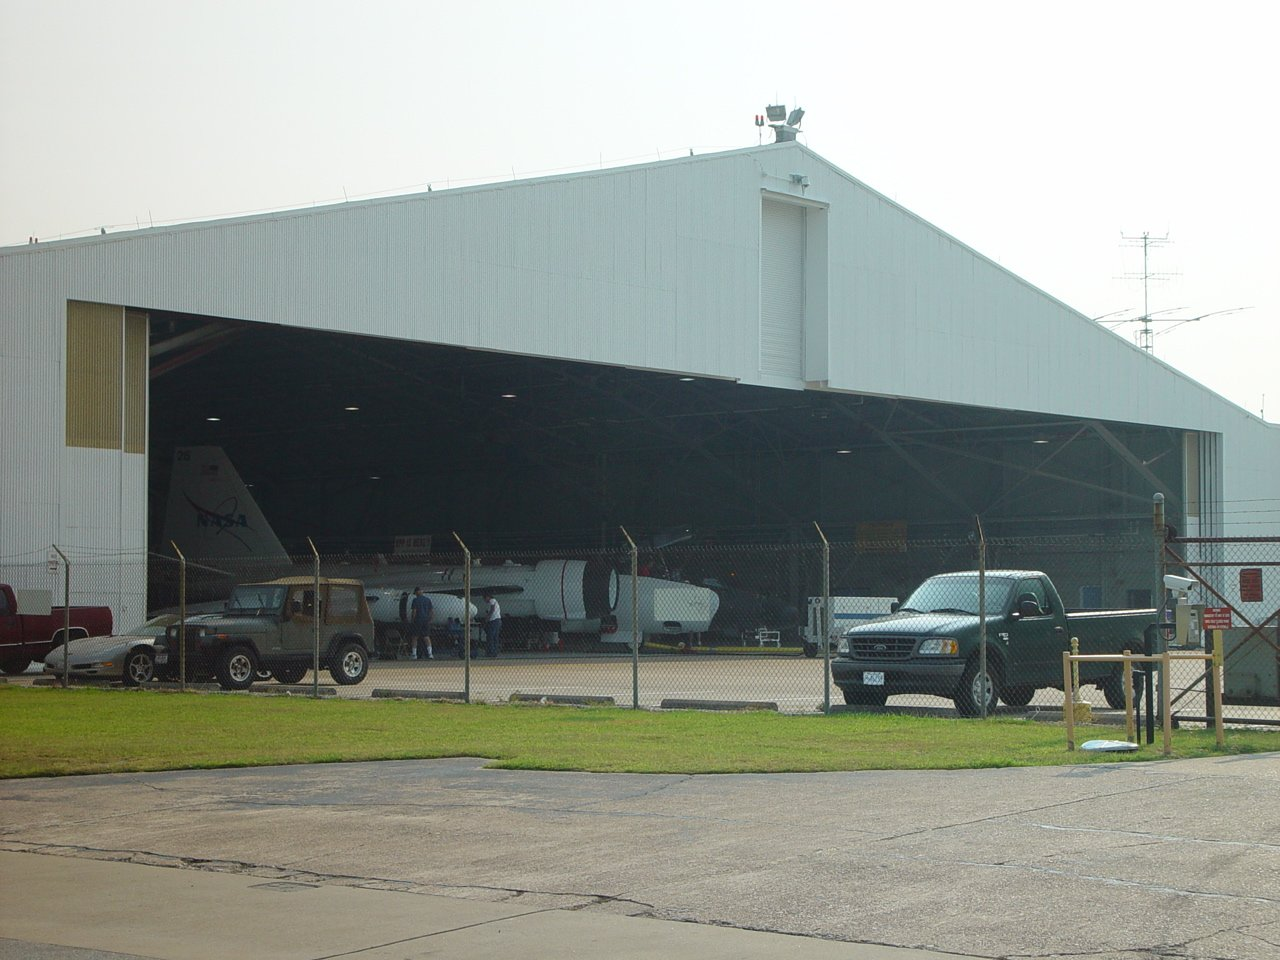 WB-57 Hangar | ESPO